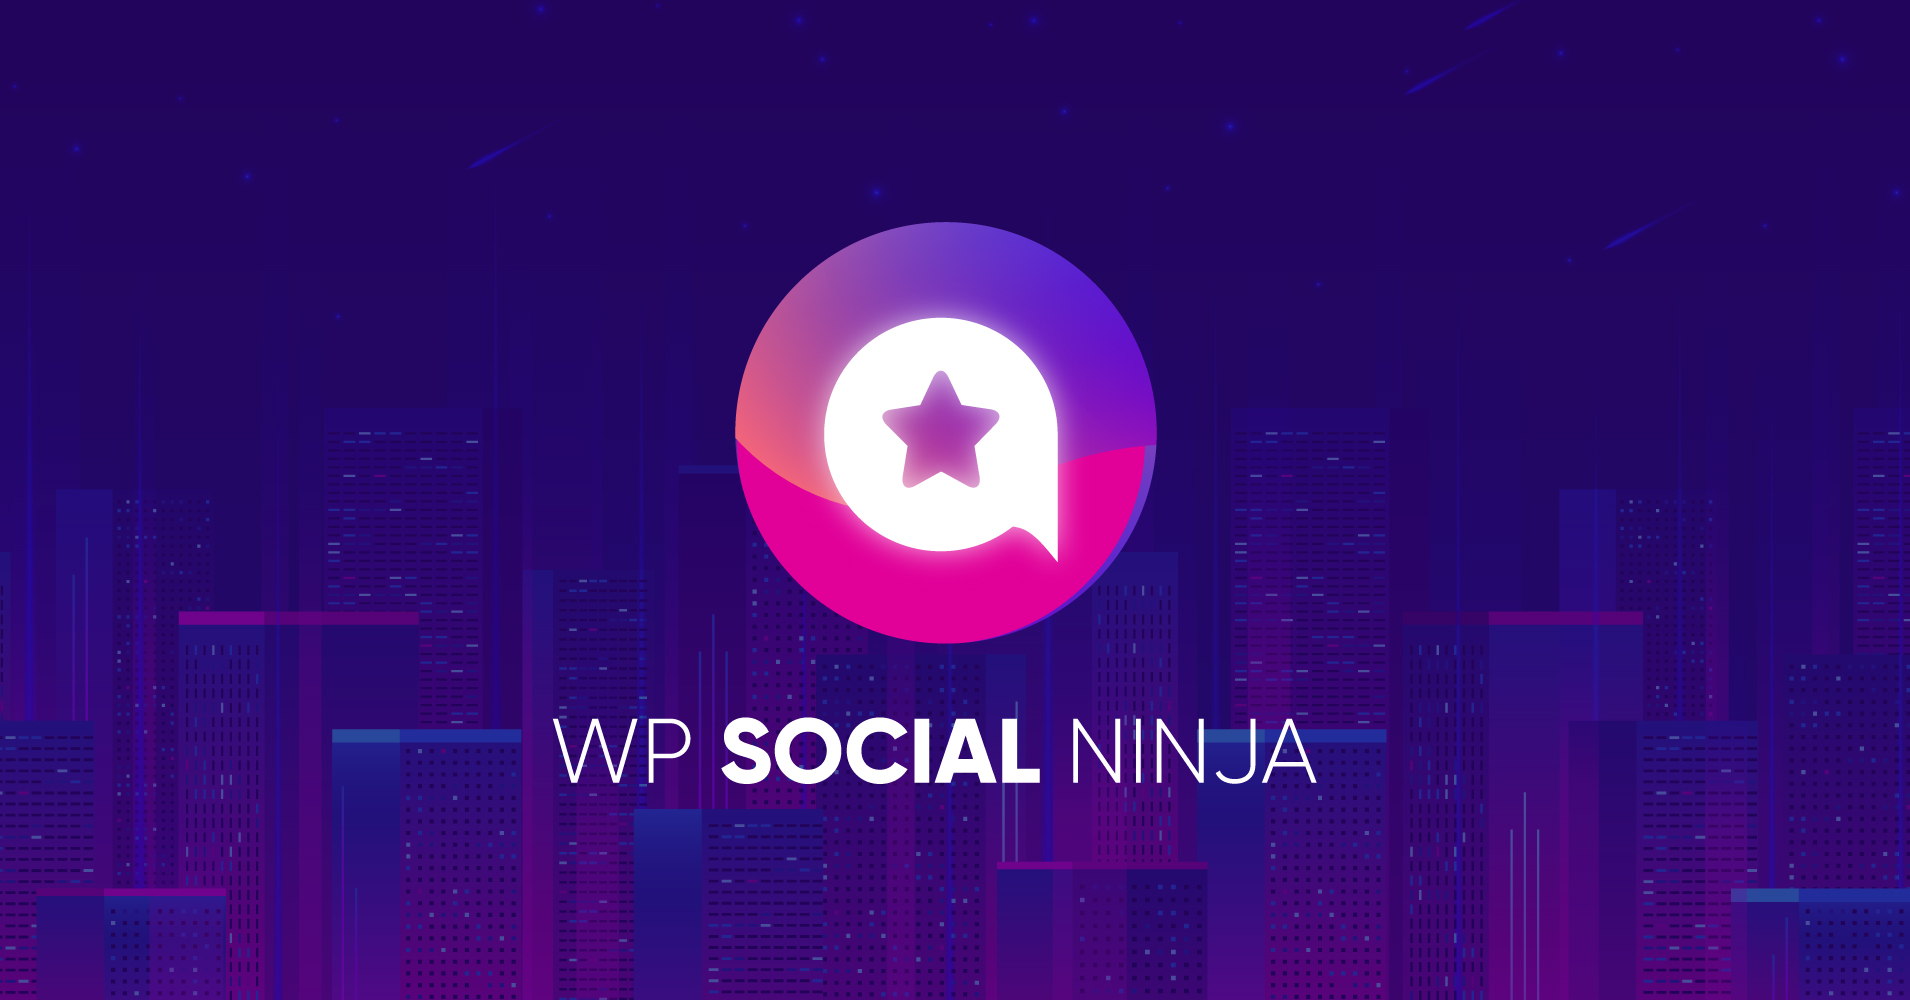 WP Social Ninja Pro – All-in-one Social Media Plugin for WordPress